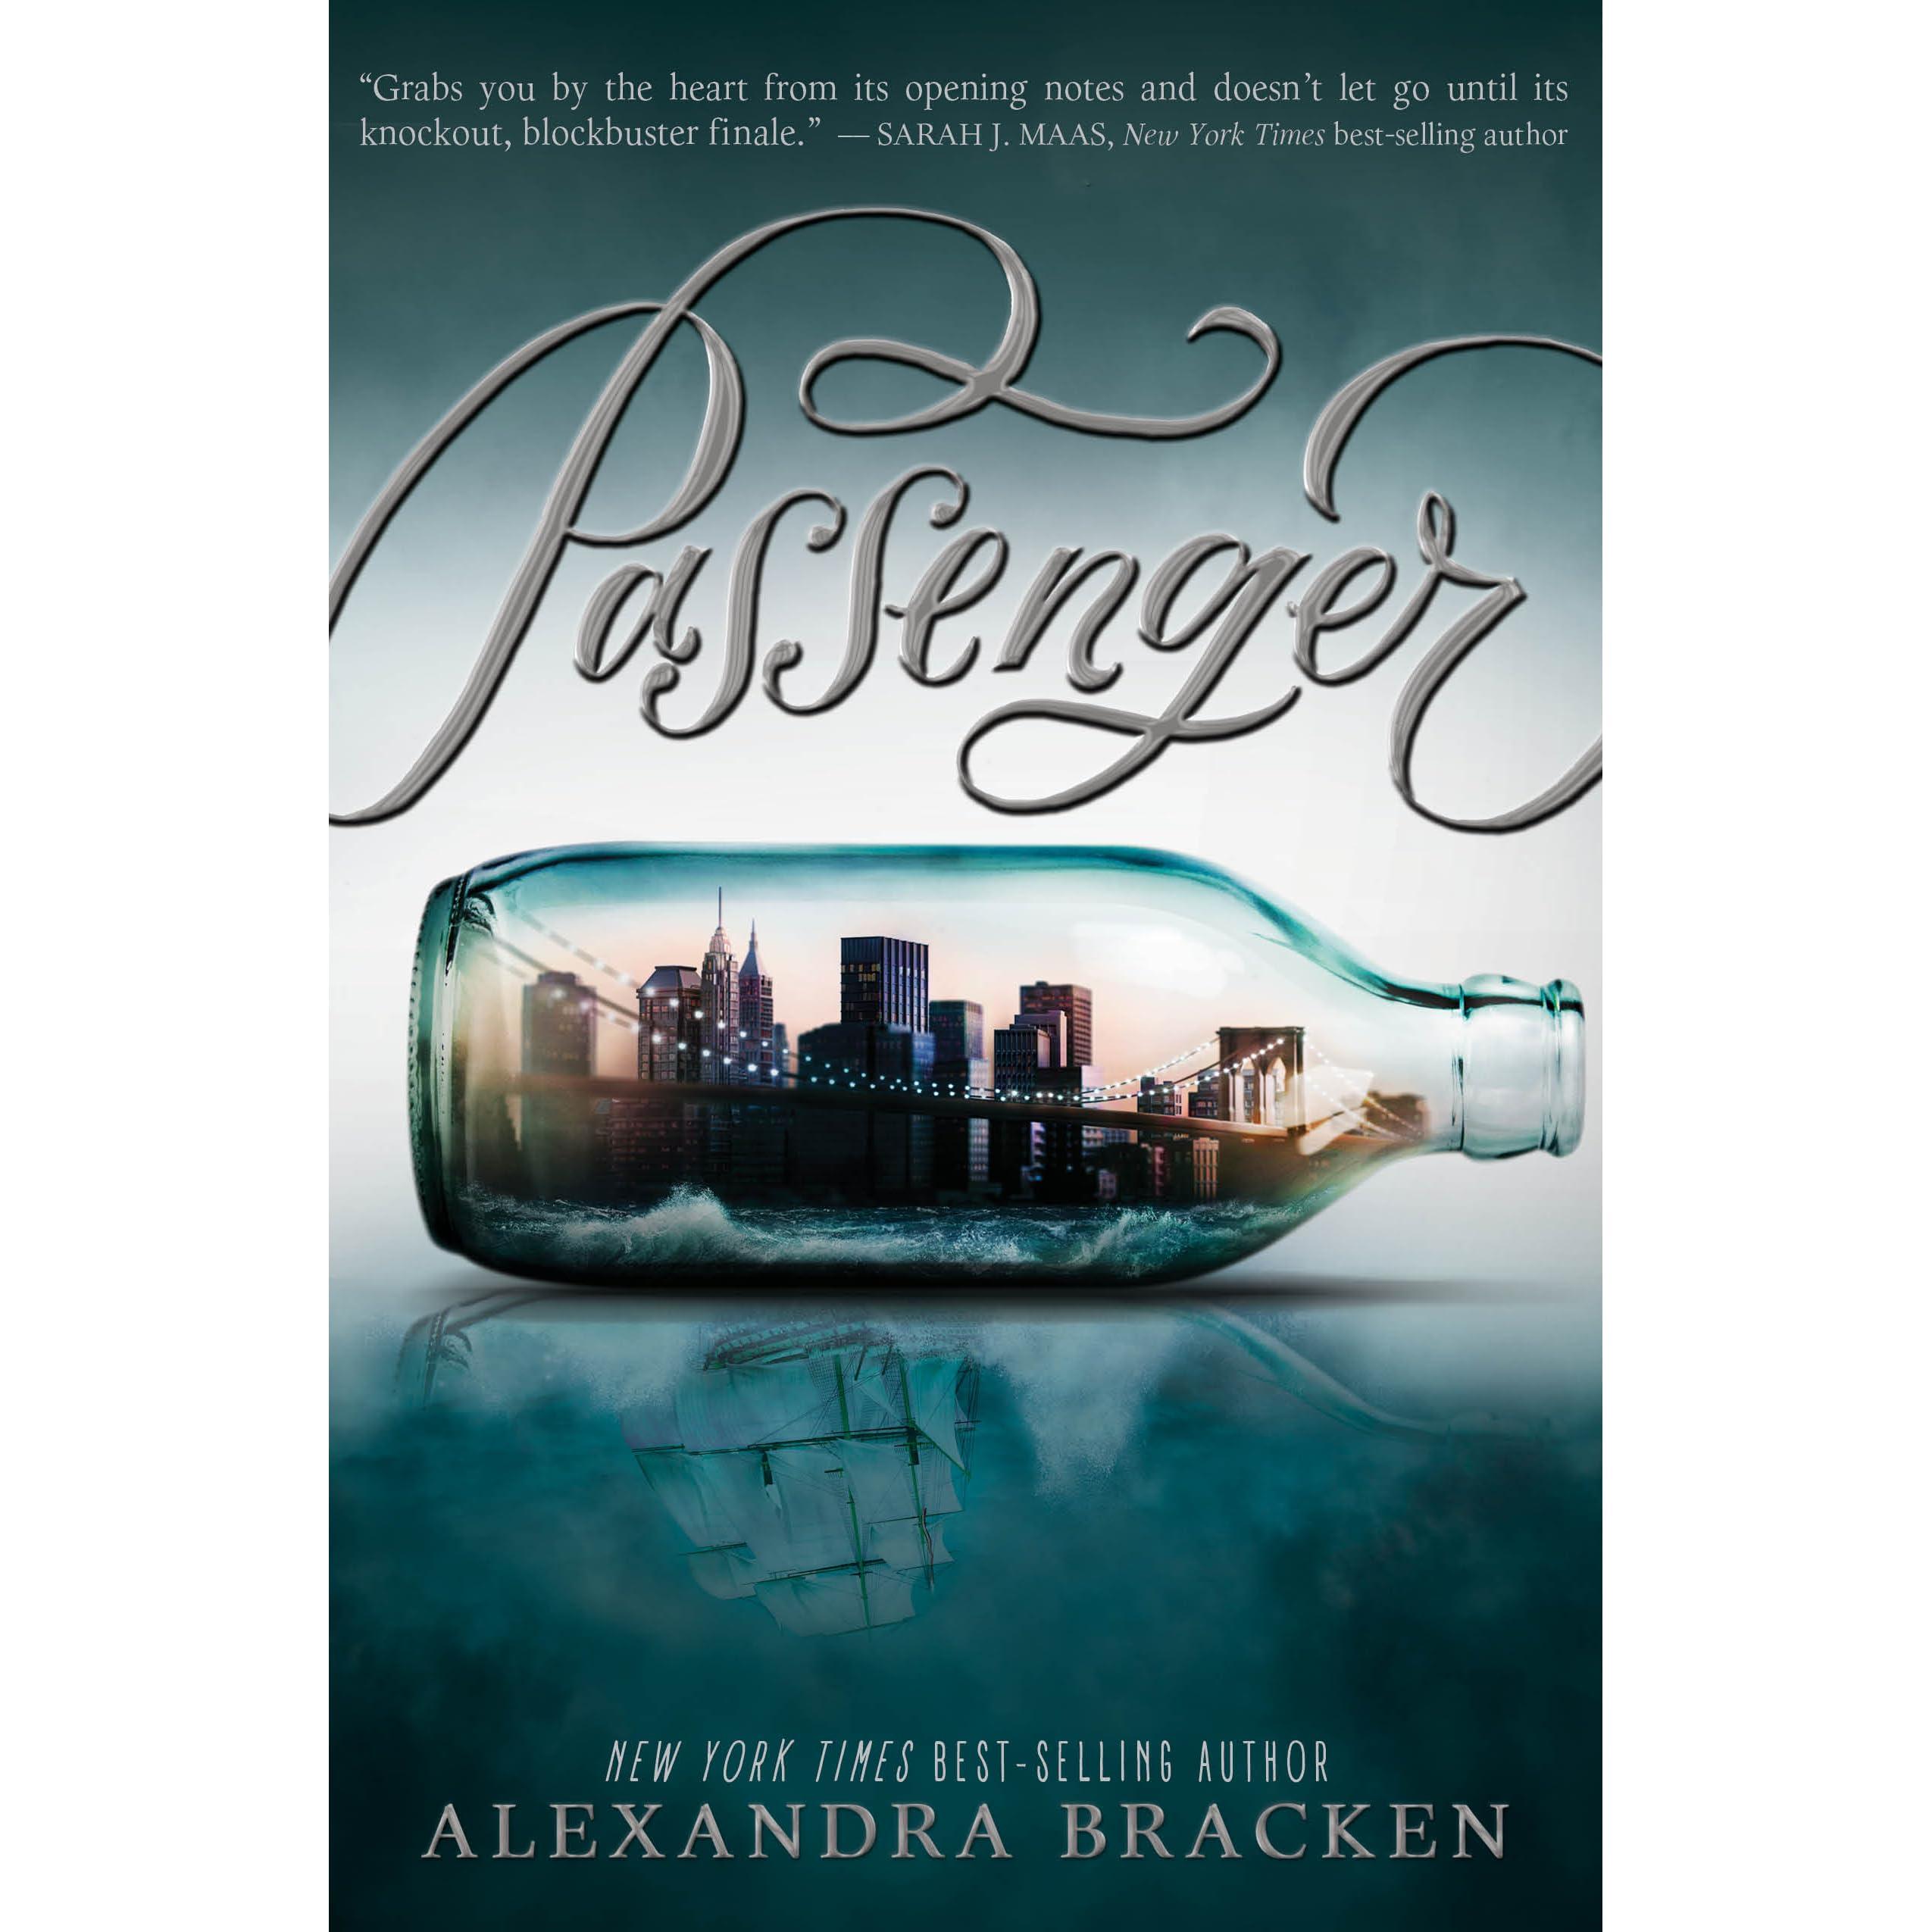 Passenger (Passenger, #1) by Alexandra Bracken